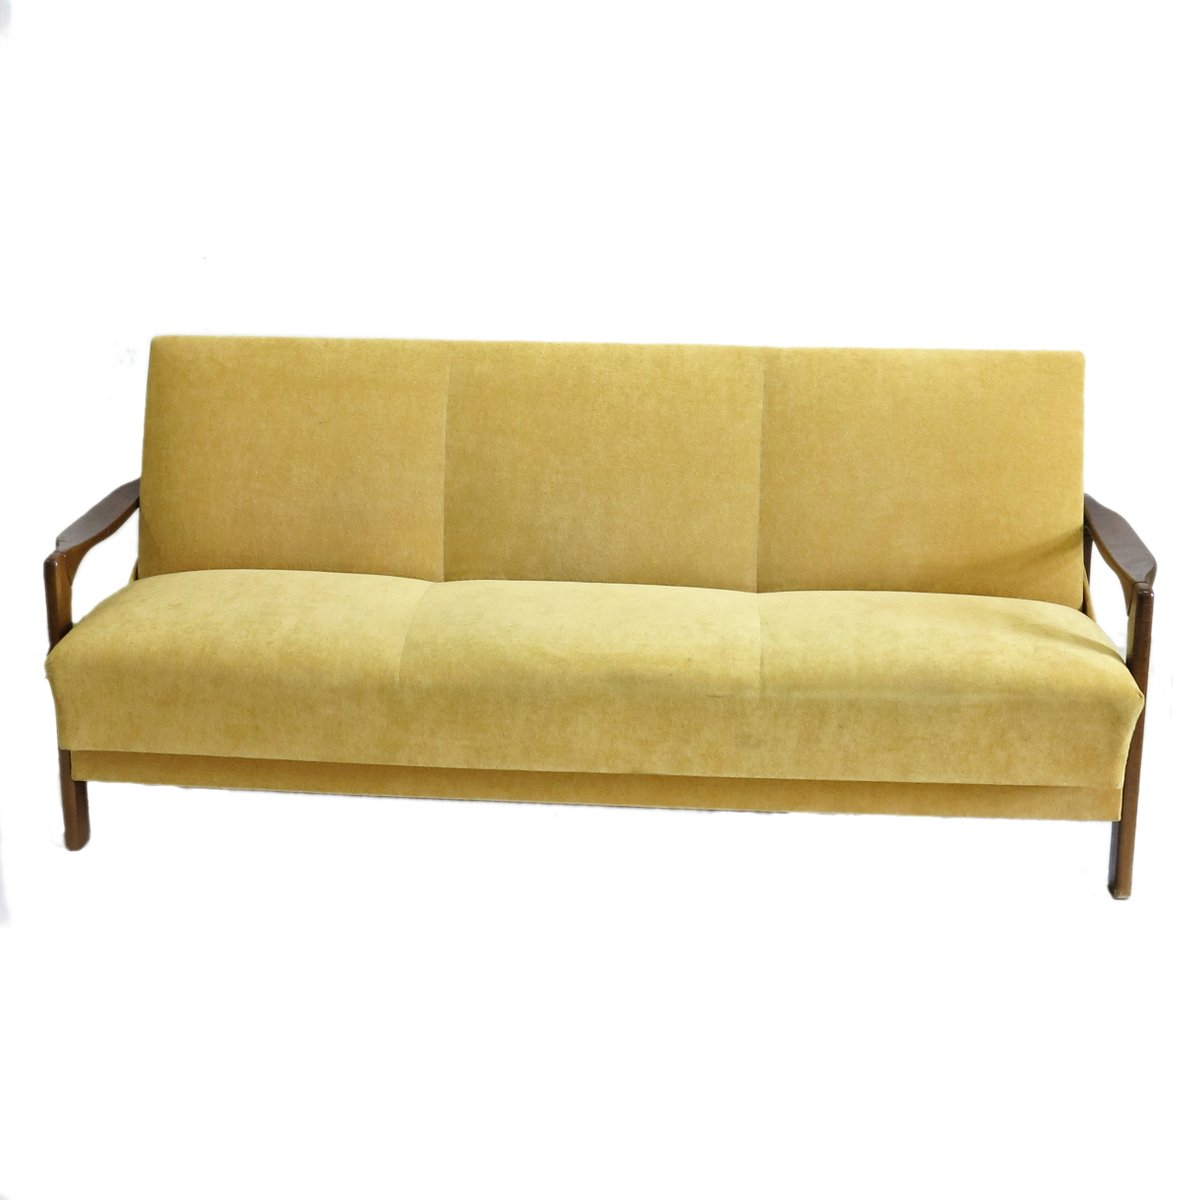 gelbes vintage sofa bei pamono kaufen. Black Bedroom Furniture Sets. Home Design Ideas